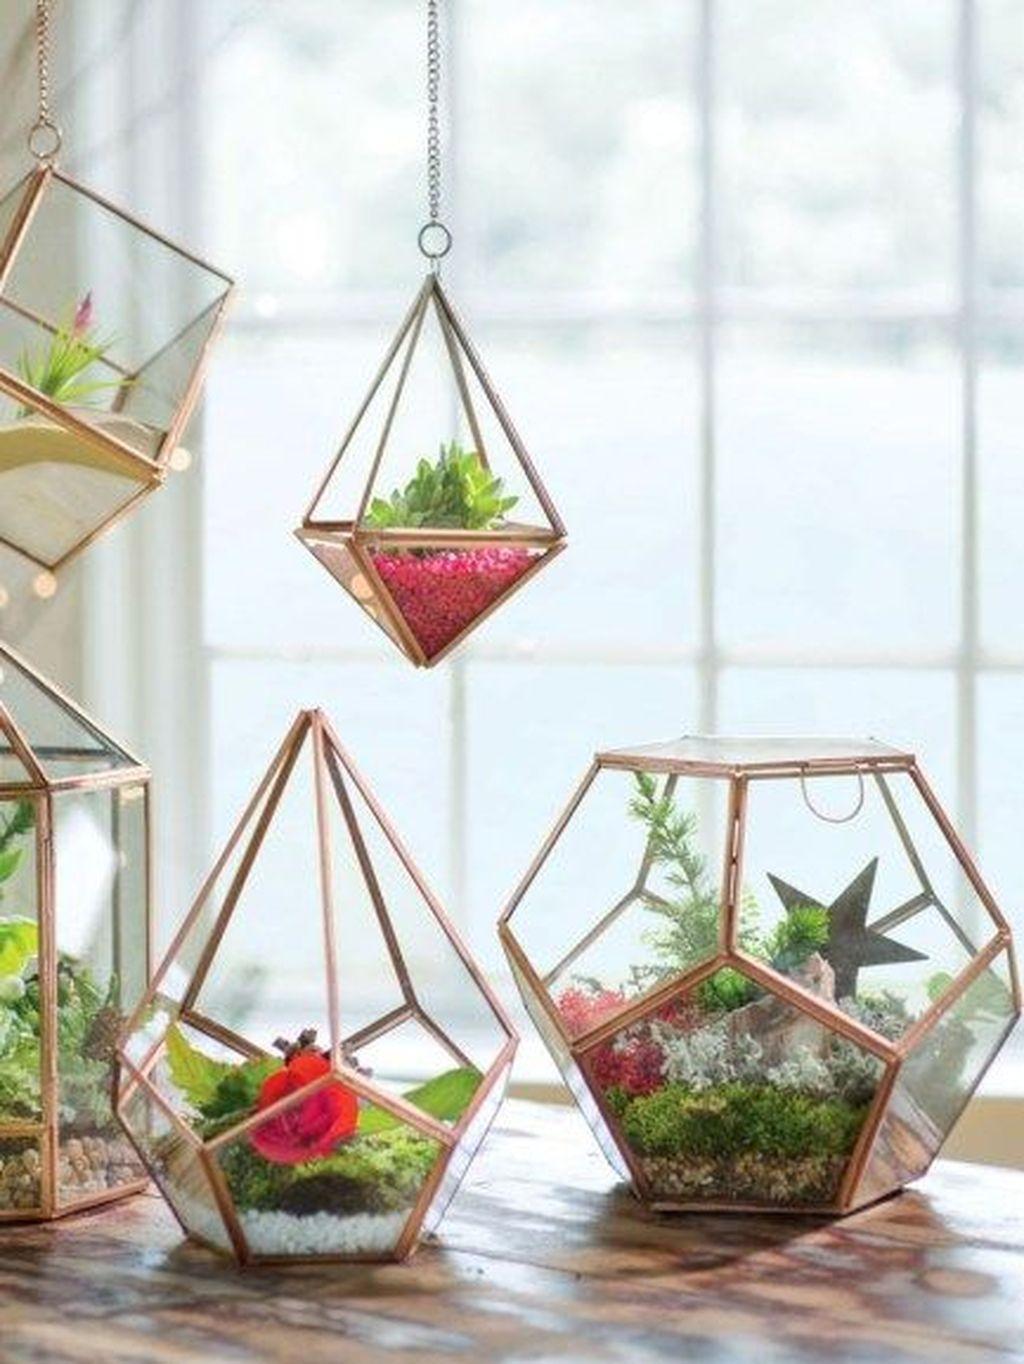 The Best Indoor Garden Ideas To Beautify Your Home 28